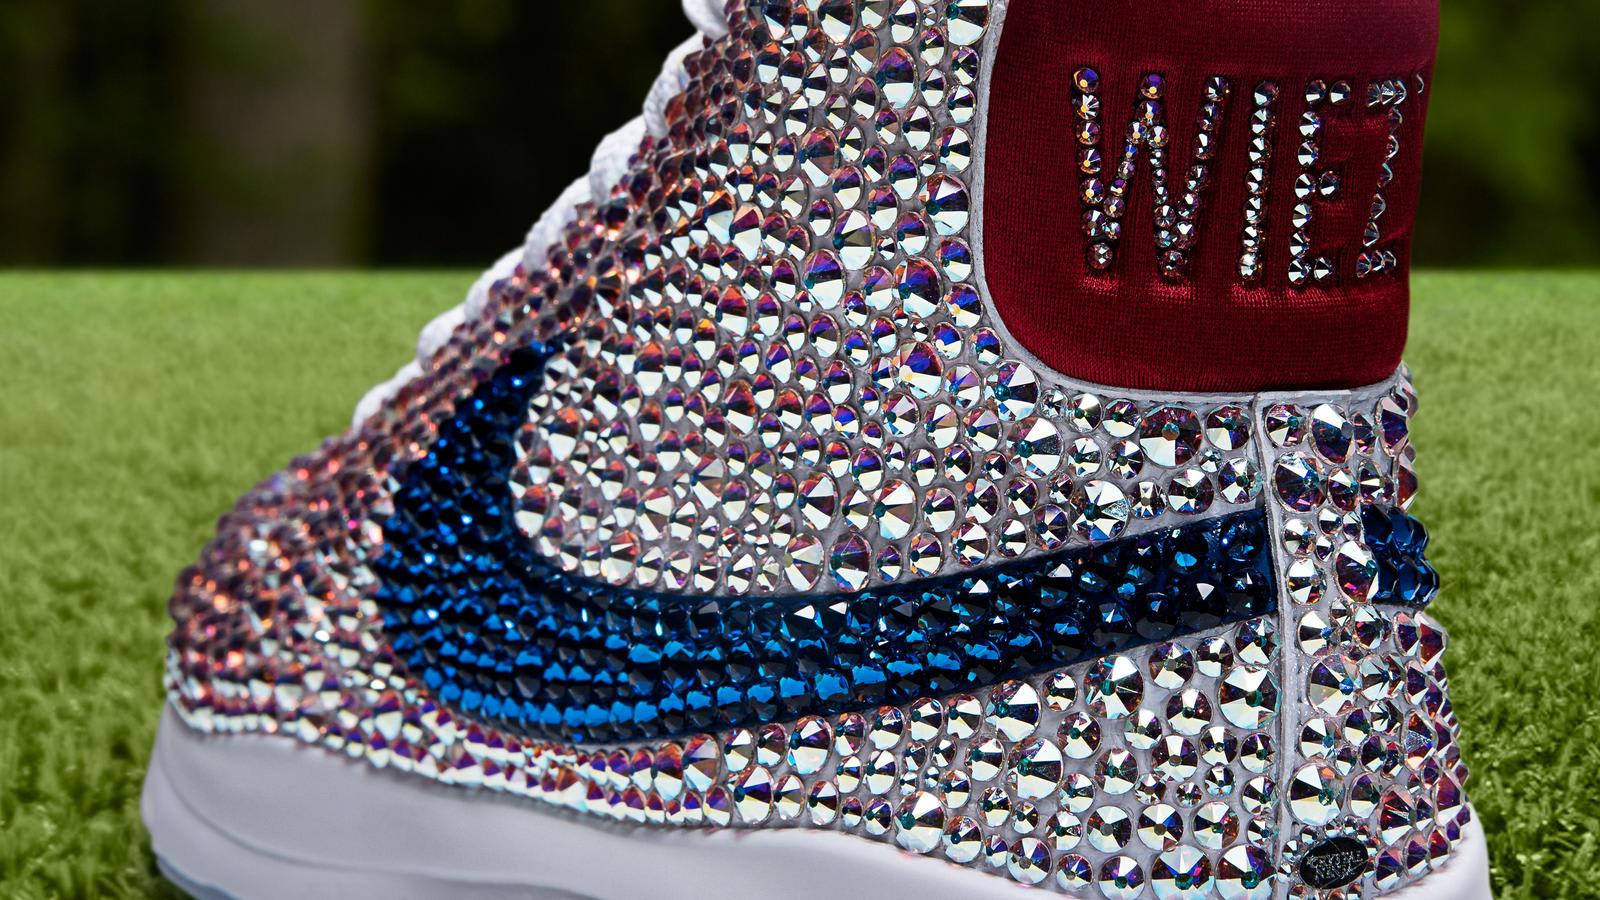 Michelle Wie Swarovski Crystal Nike Blazer Golf Shoes Collar